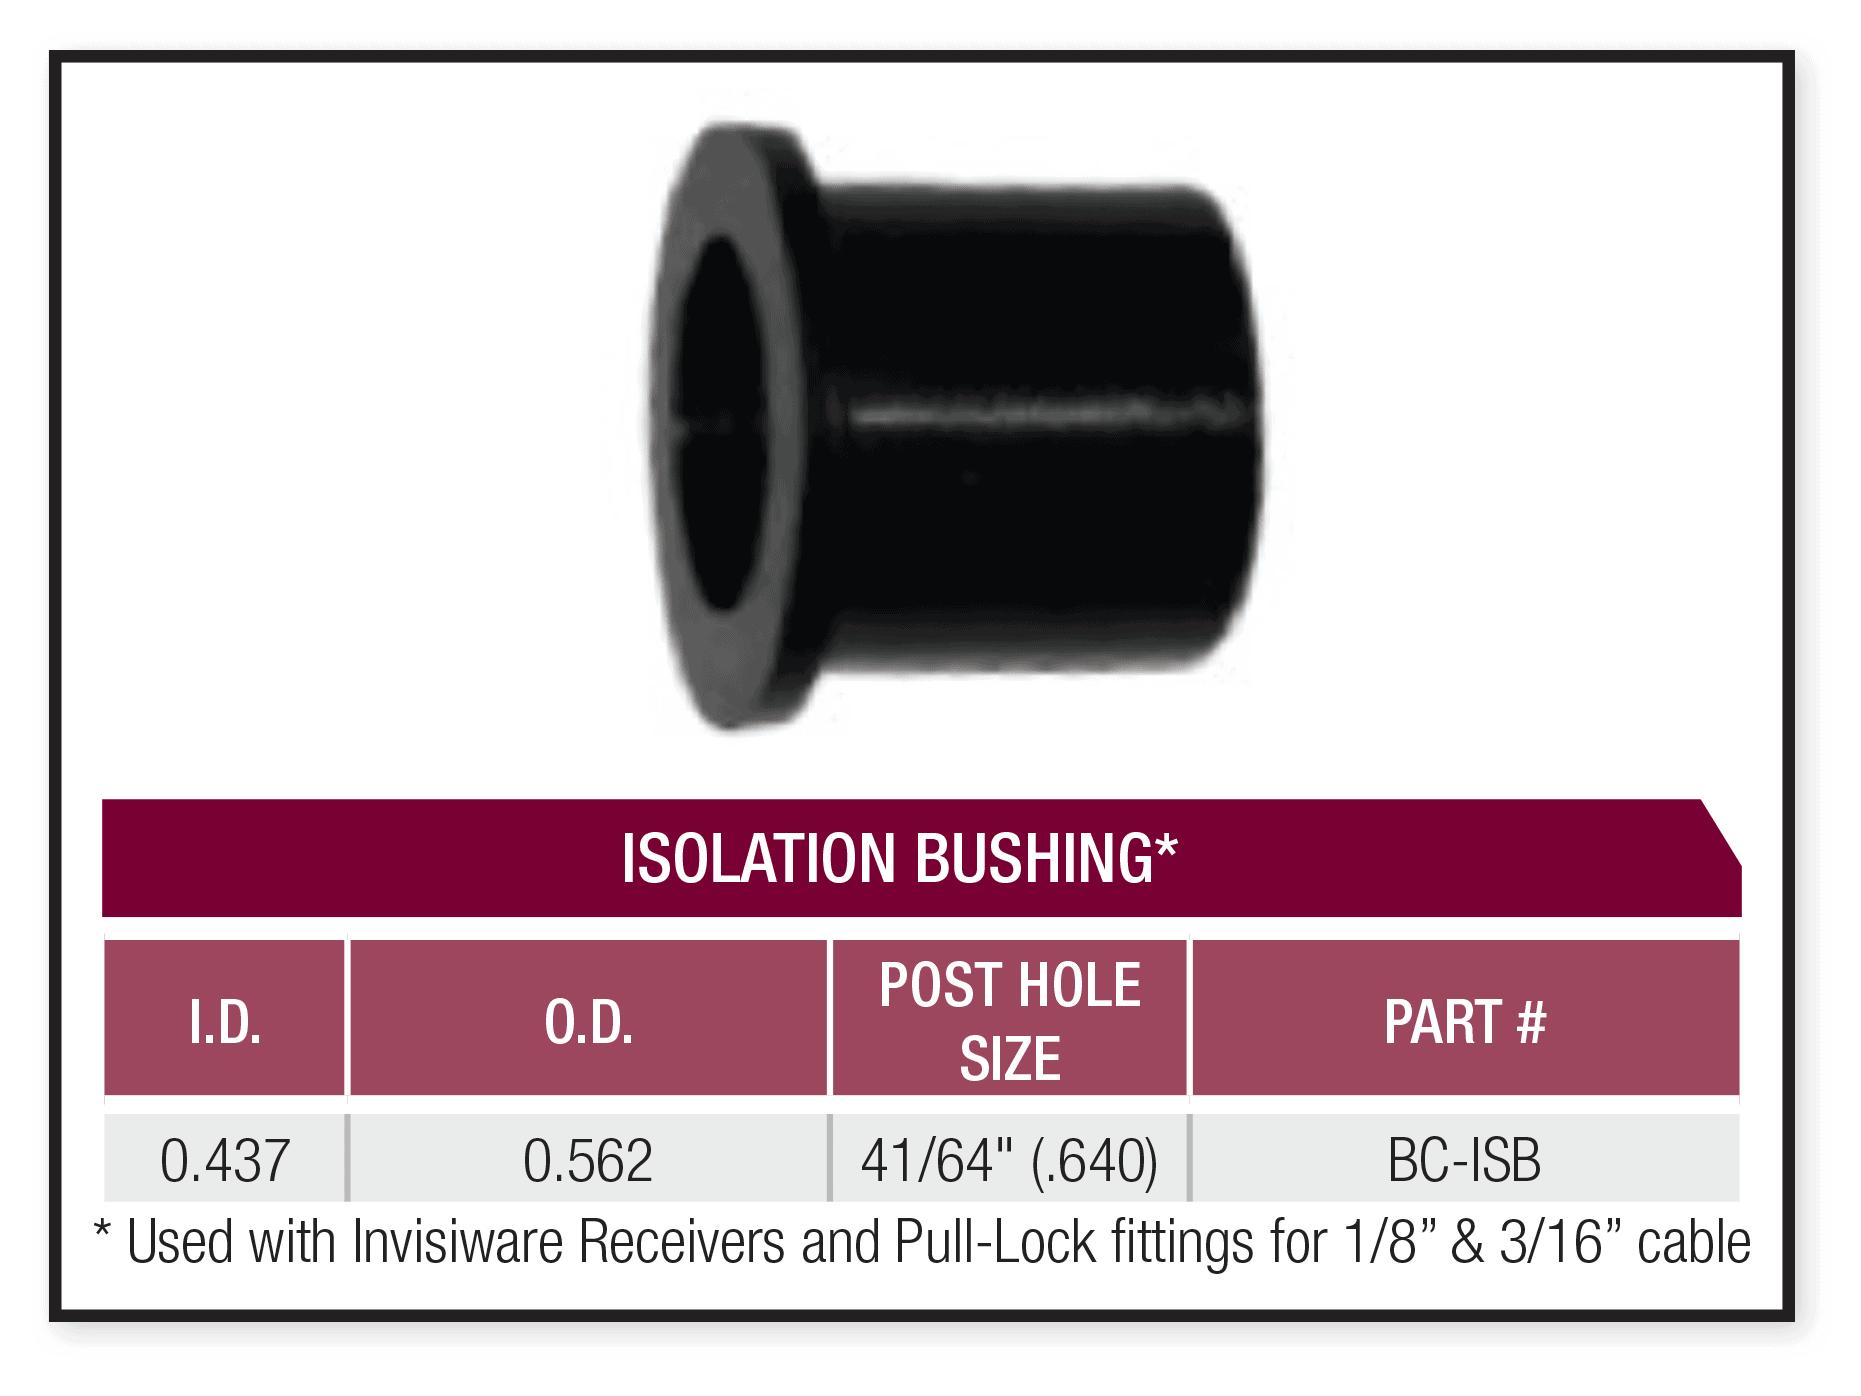 isolation bushing specifications